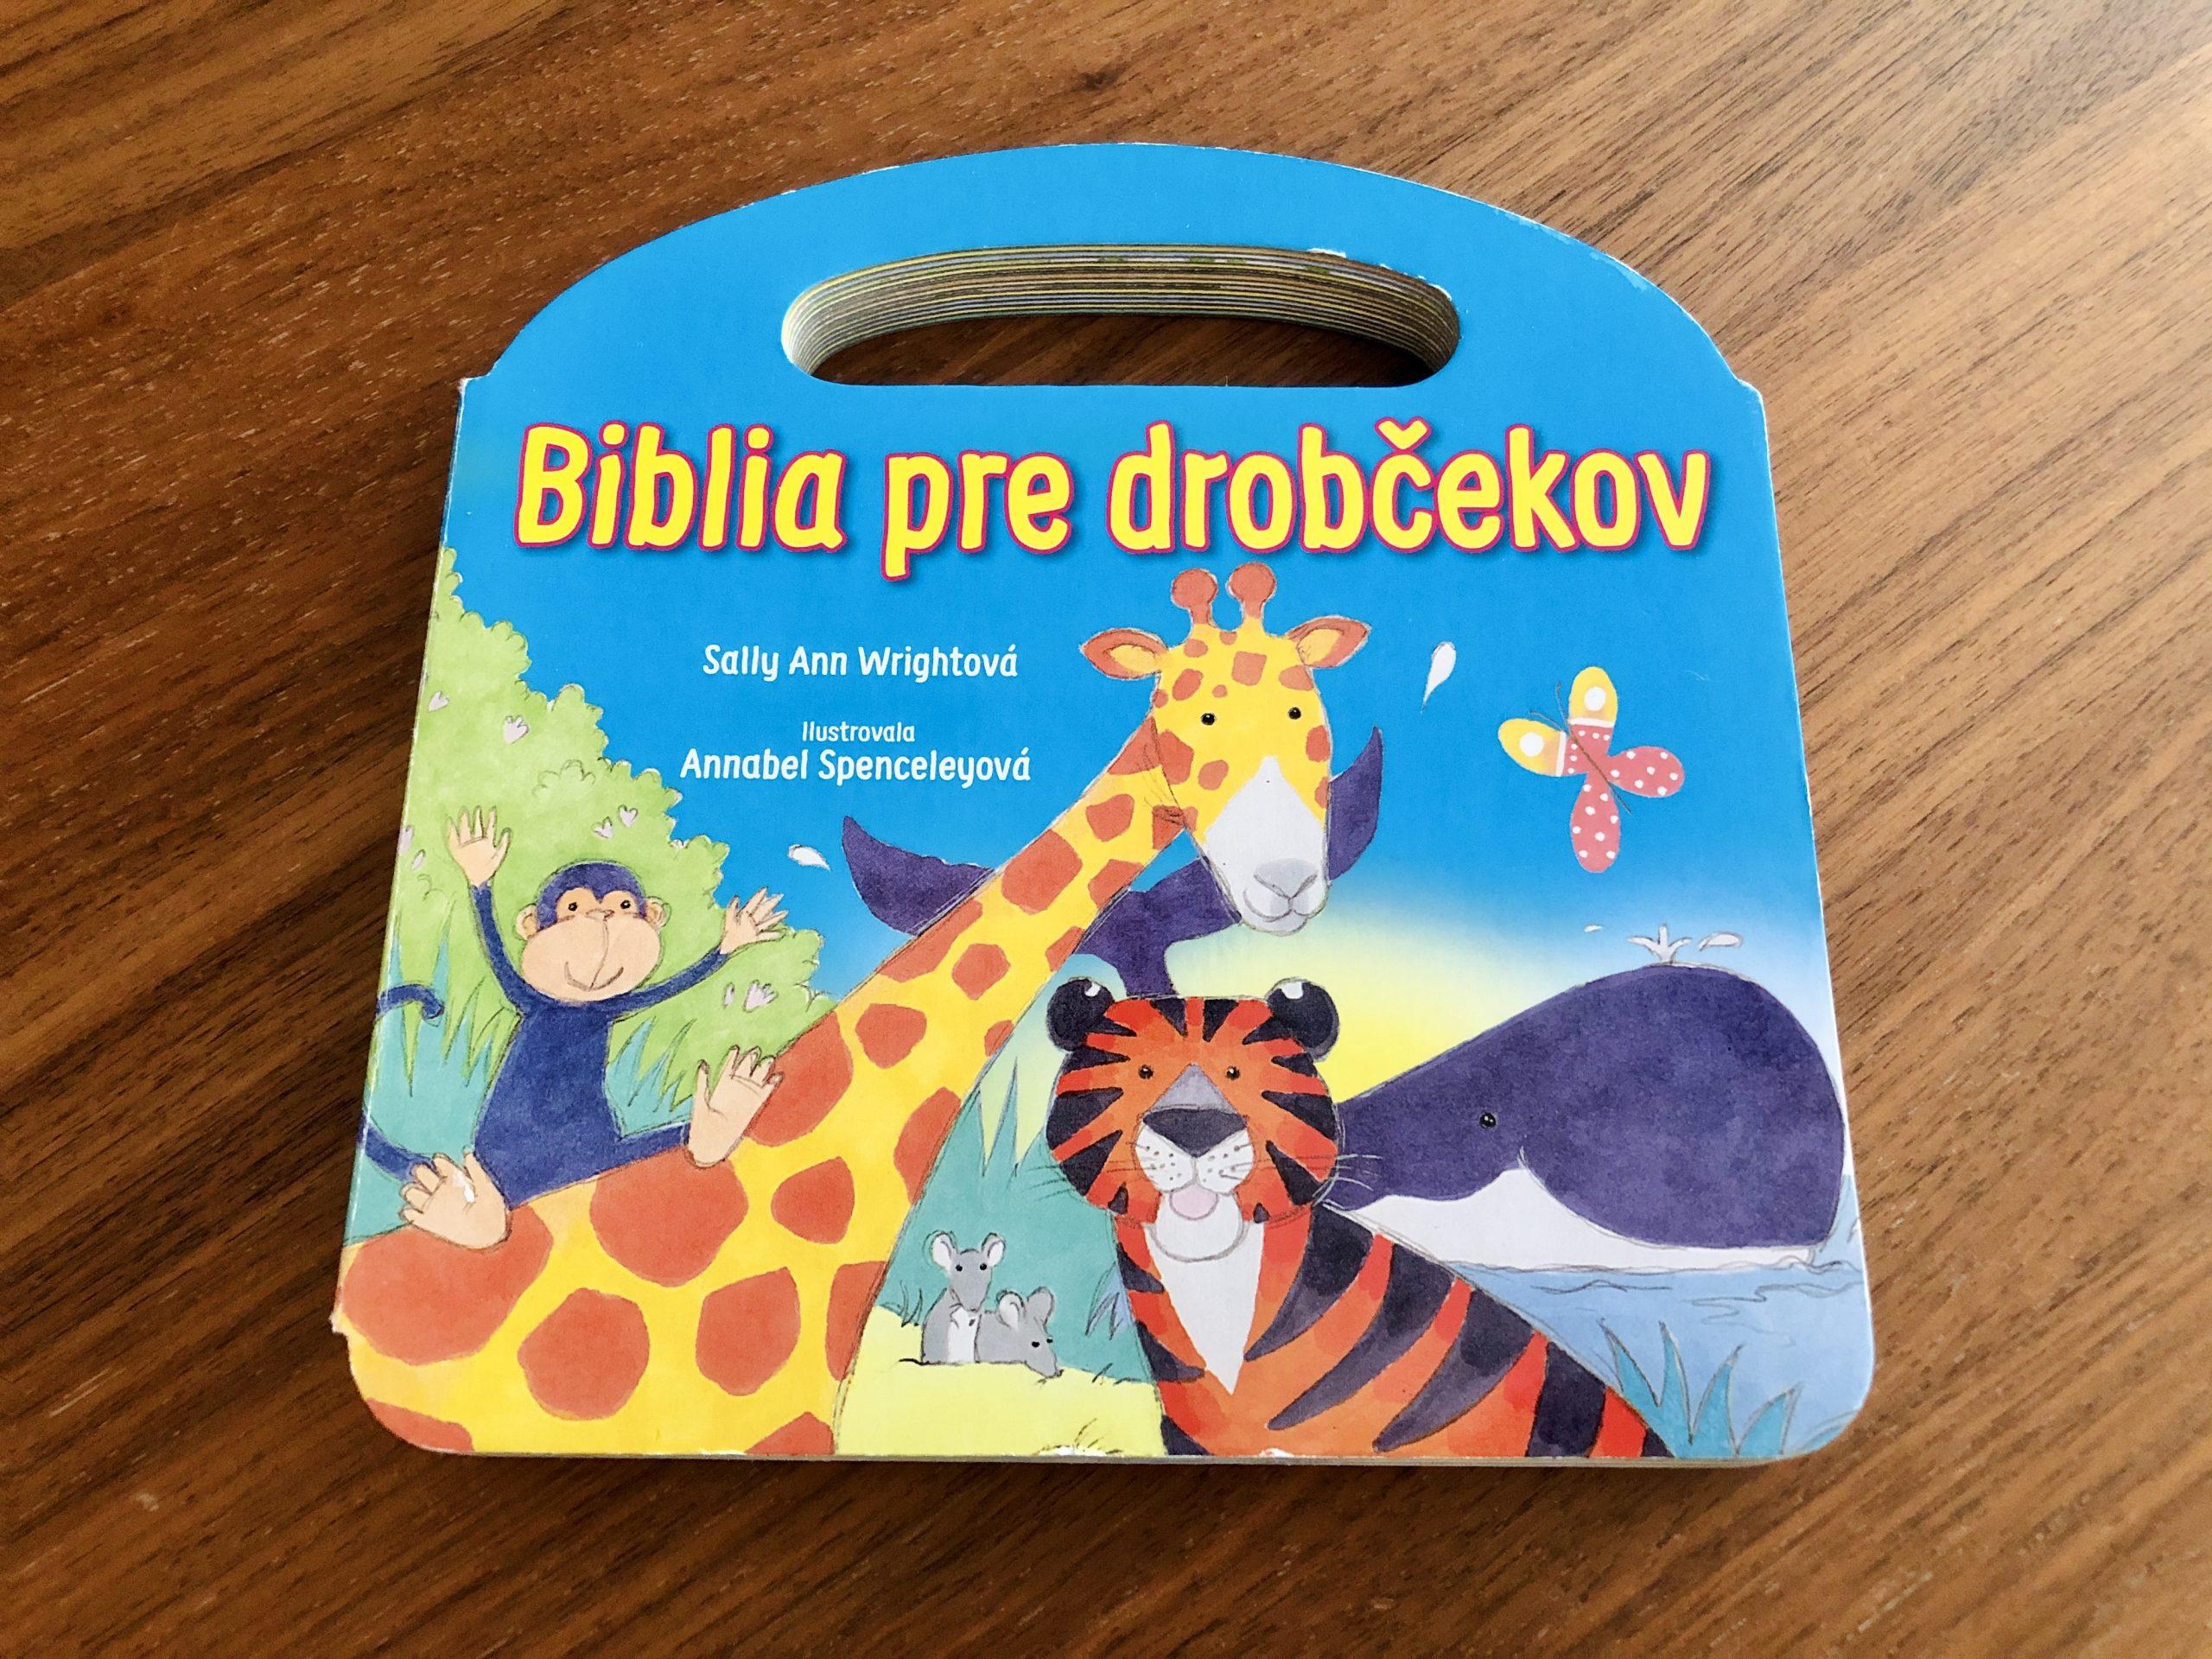 biblia pre drobcekov